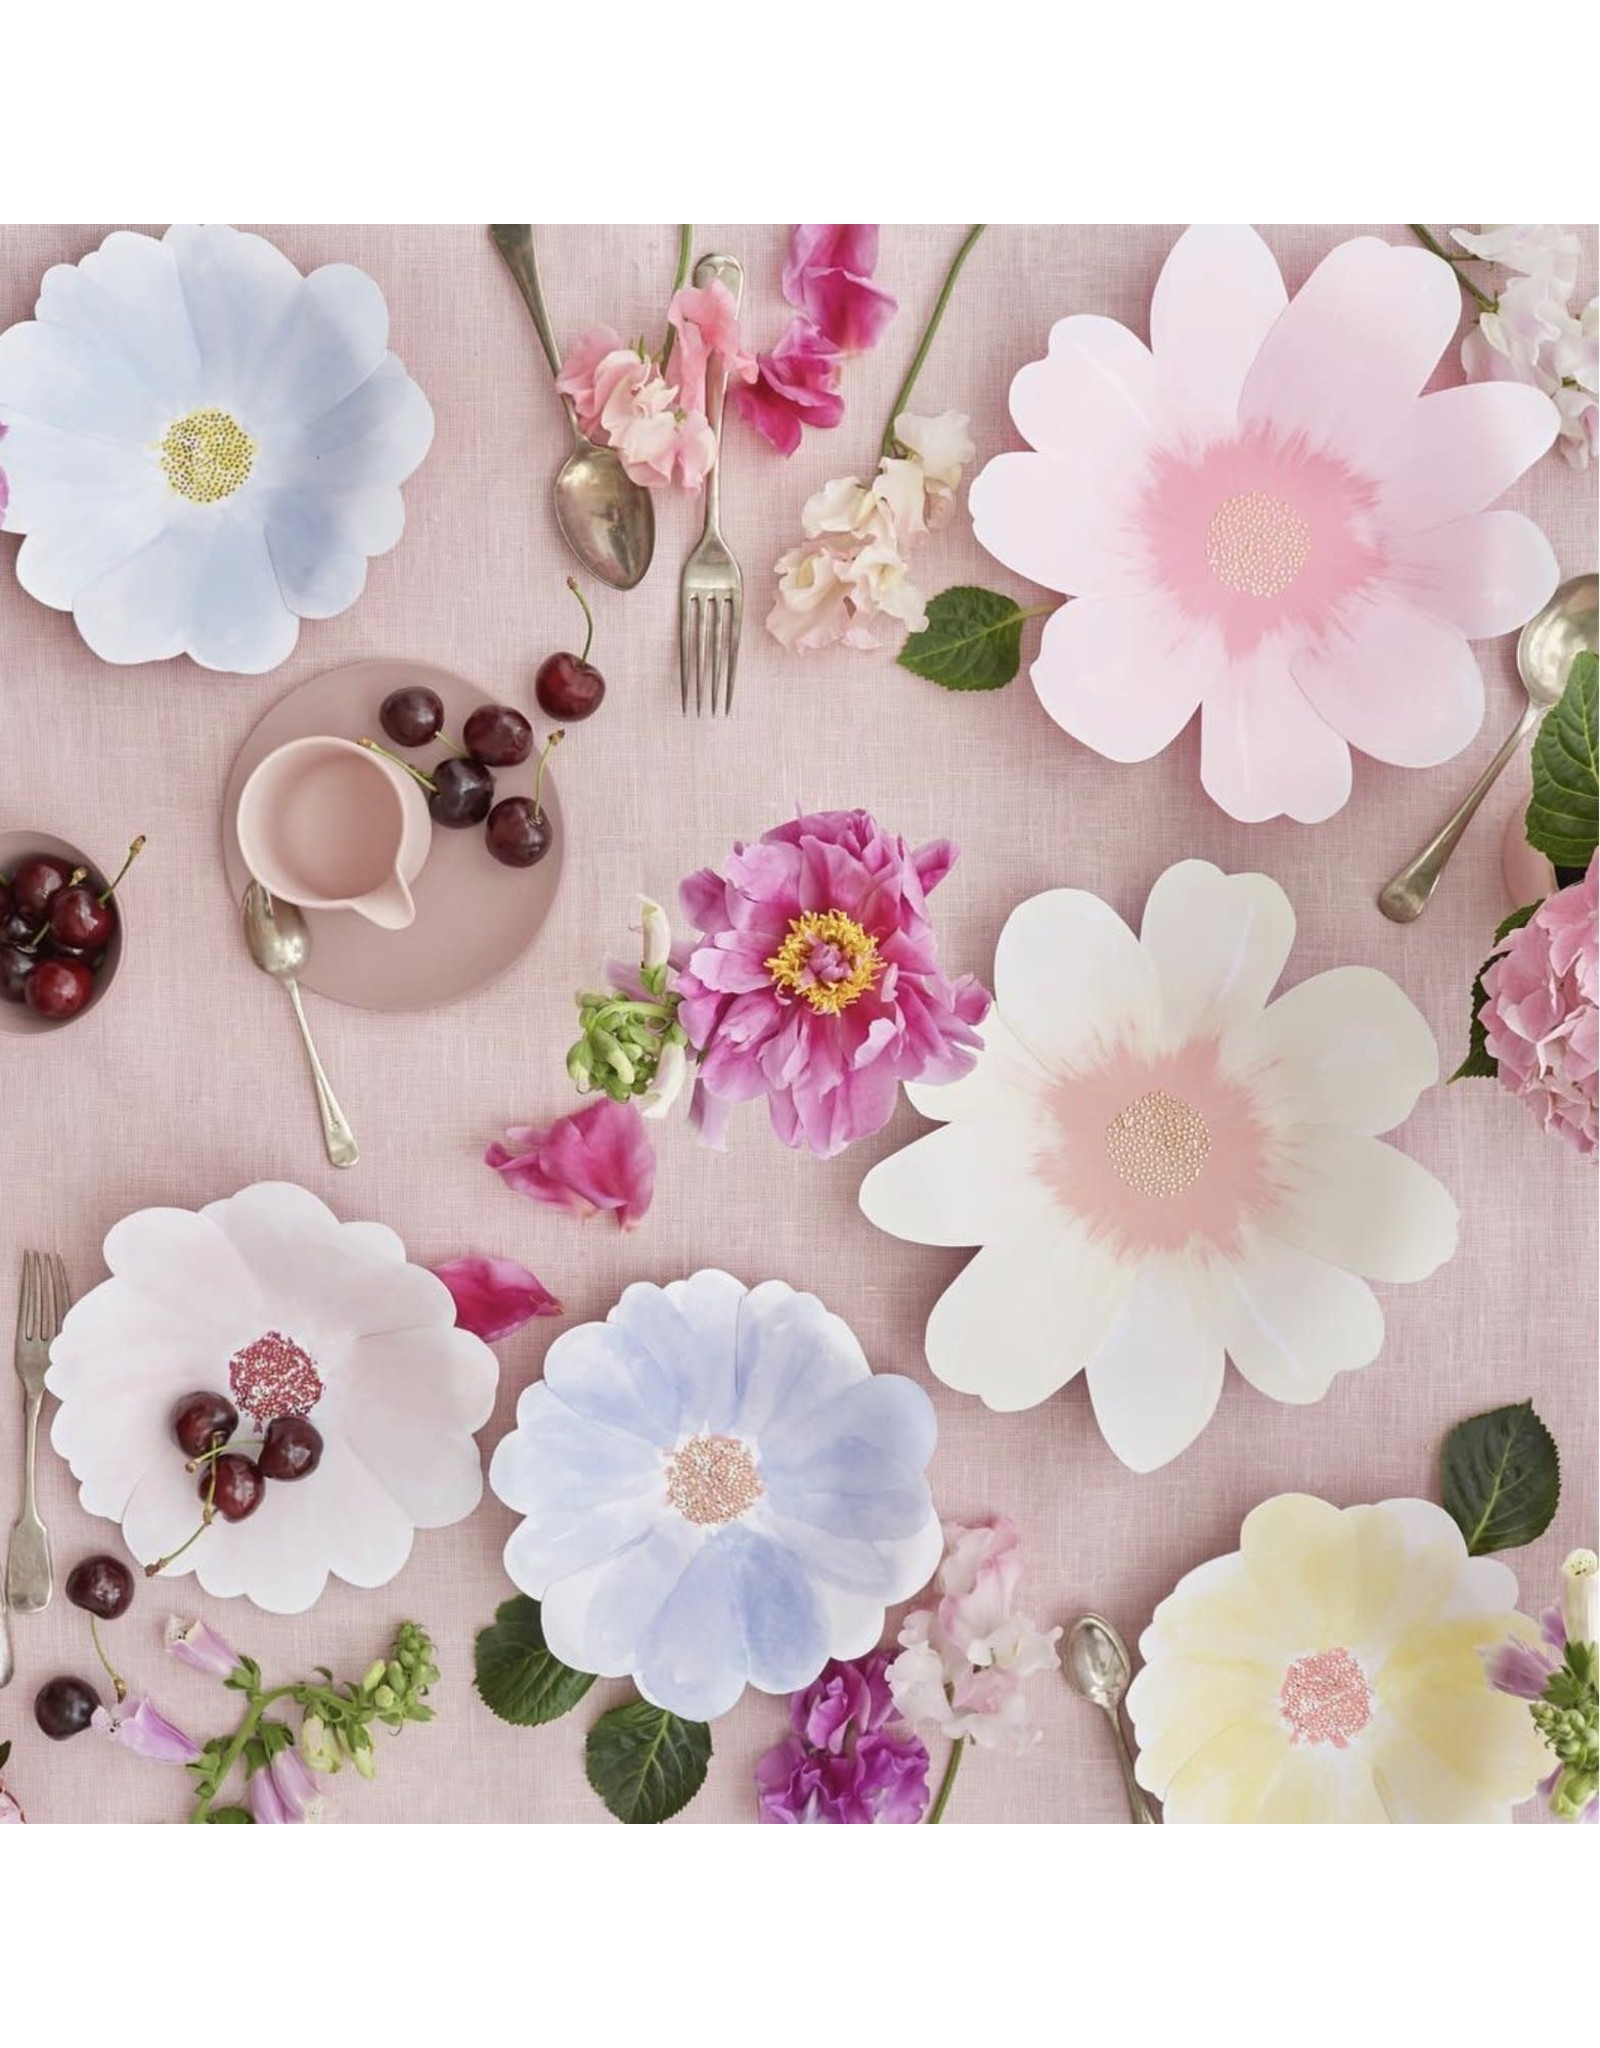 Meri Meri Flower Garden Large Plates